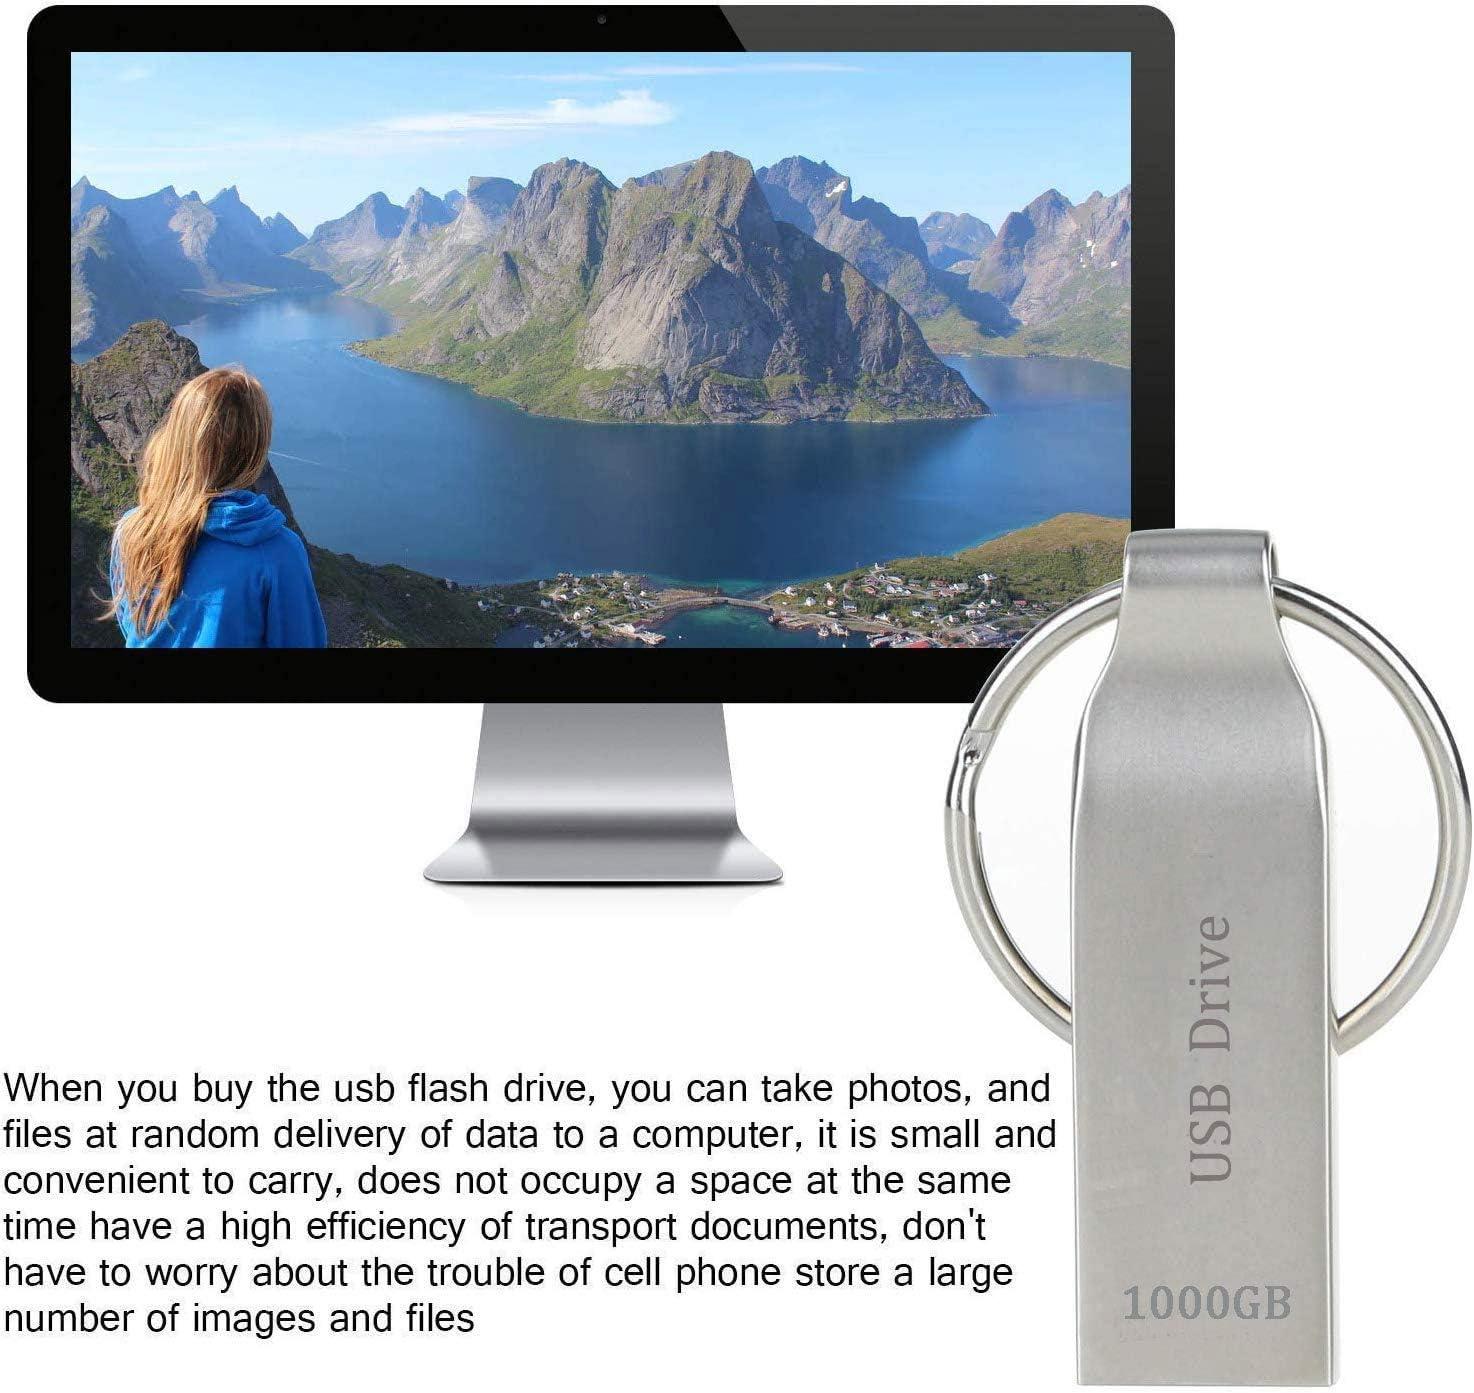 Erasky Flash Drive 1TB USB Flash Drive USB 3.0 Waterproof USB Drive Thumb Drives Memory Stick with Keychain USB Stick for Storage and Backup 1000gb